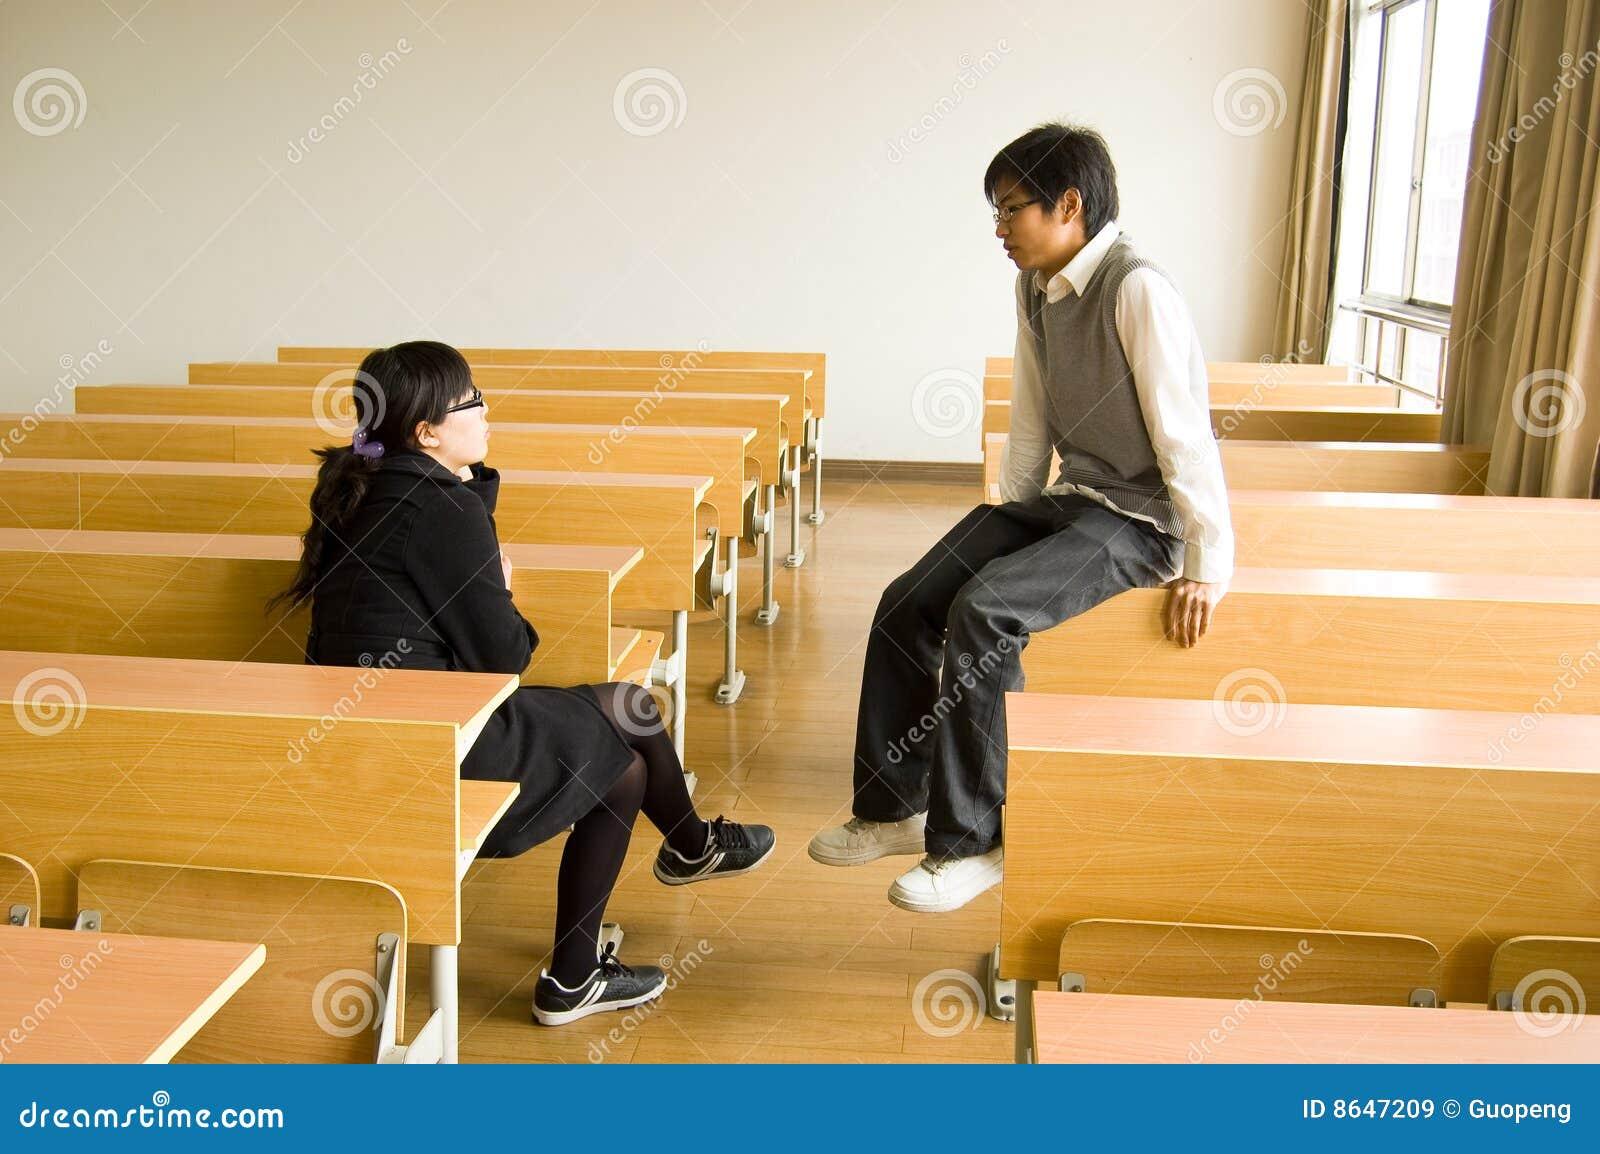 Asiatische Hochschulstudenten